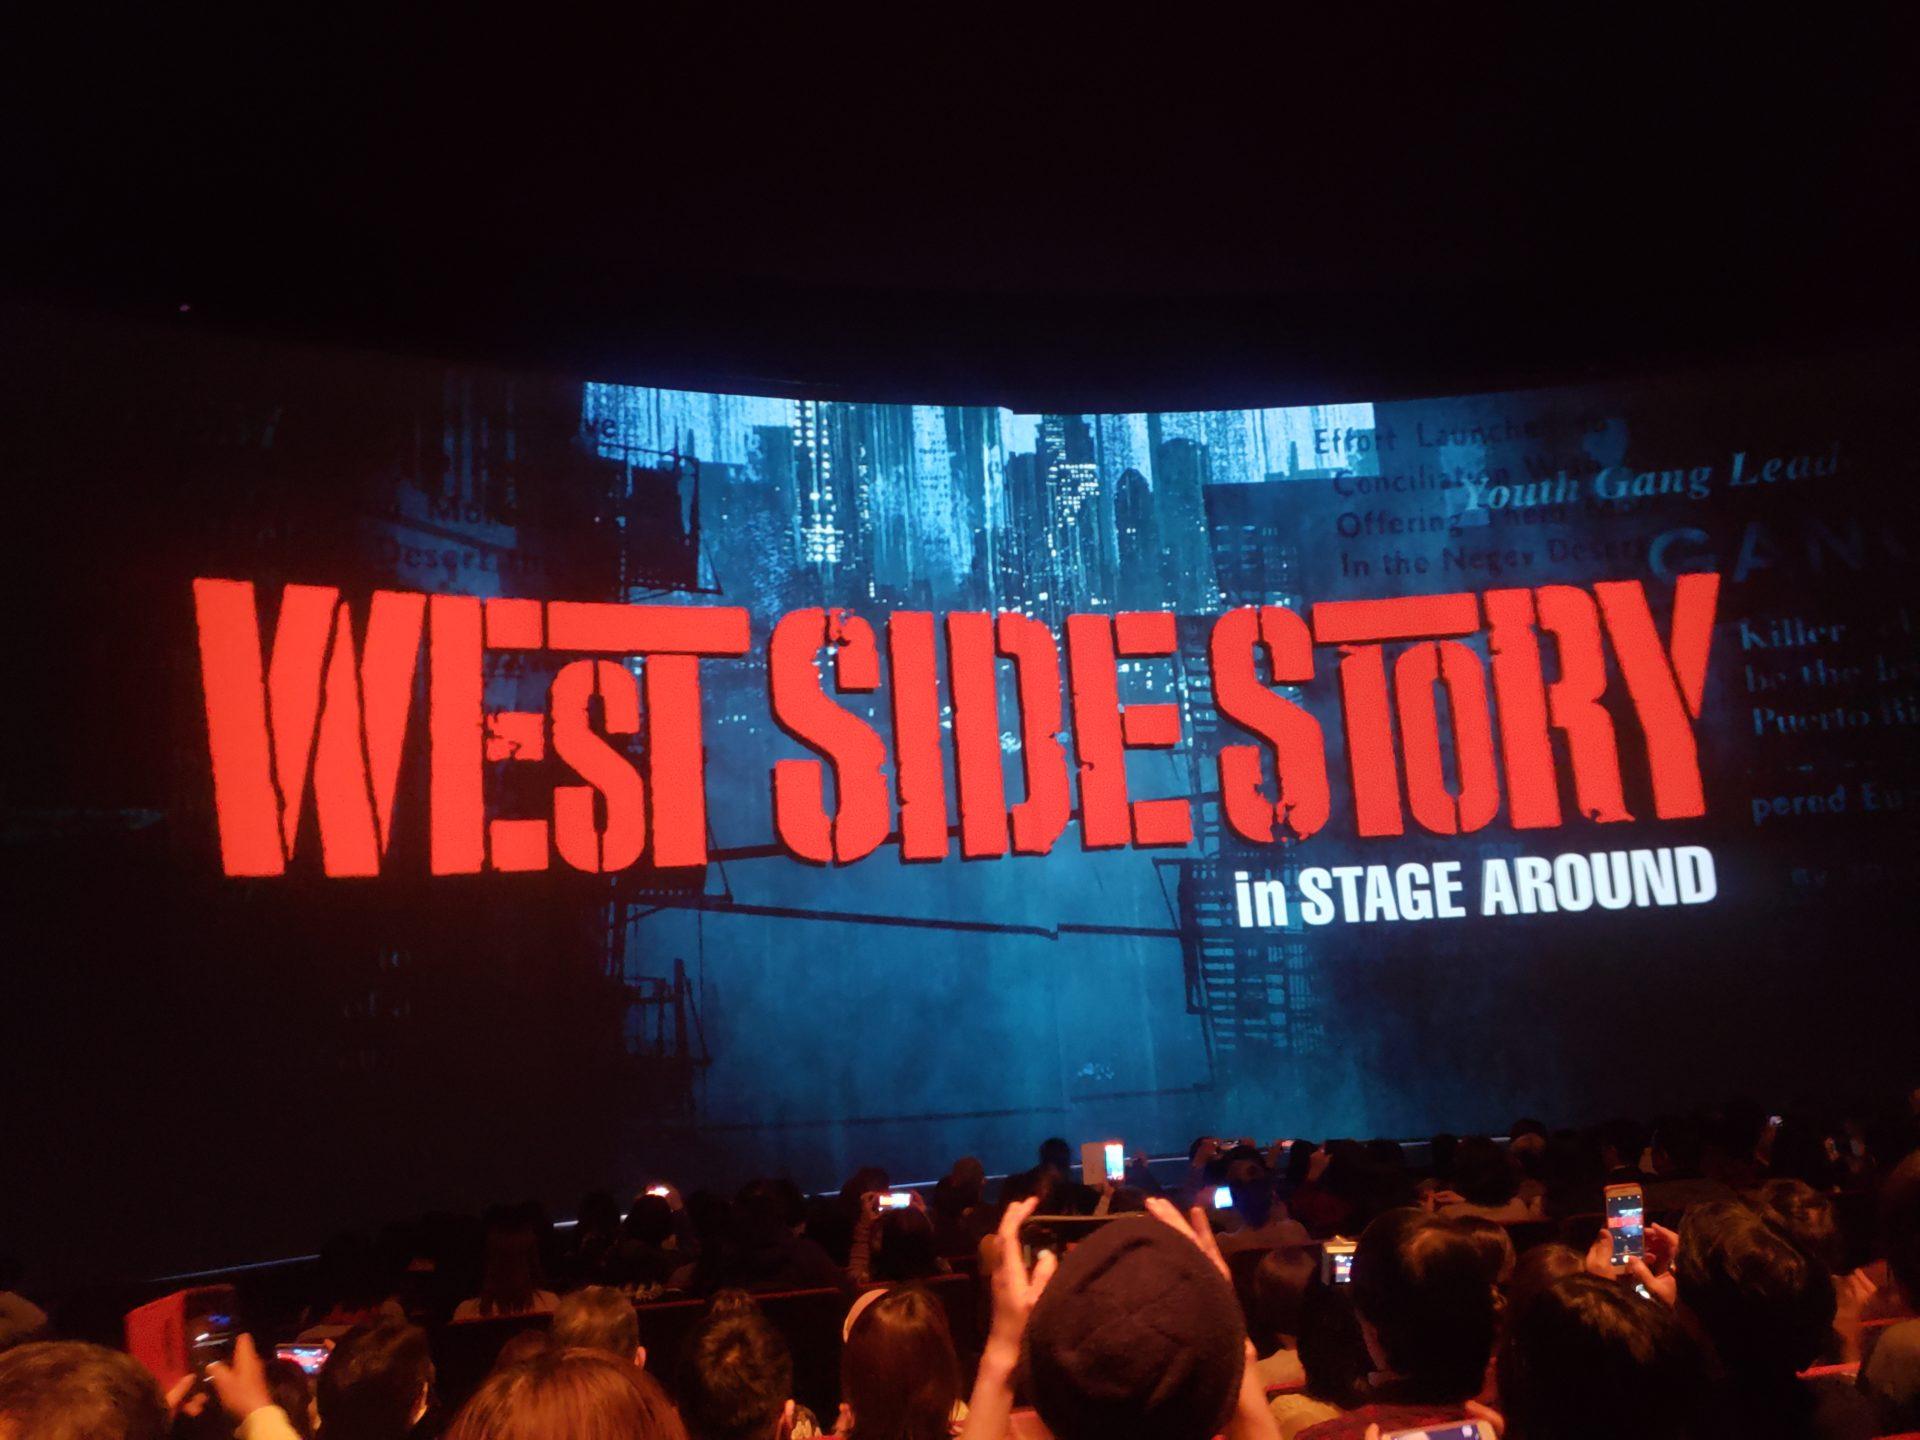 WEST SIDE STORYseason2 観劇しました。